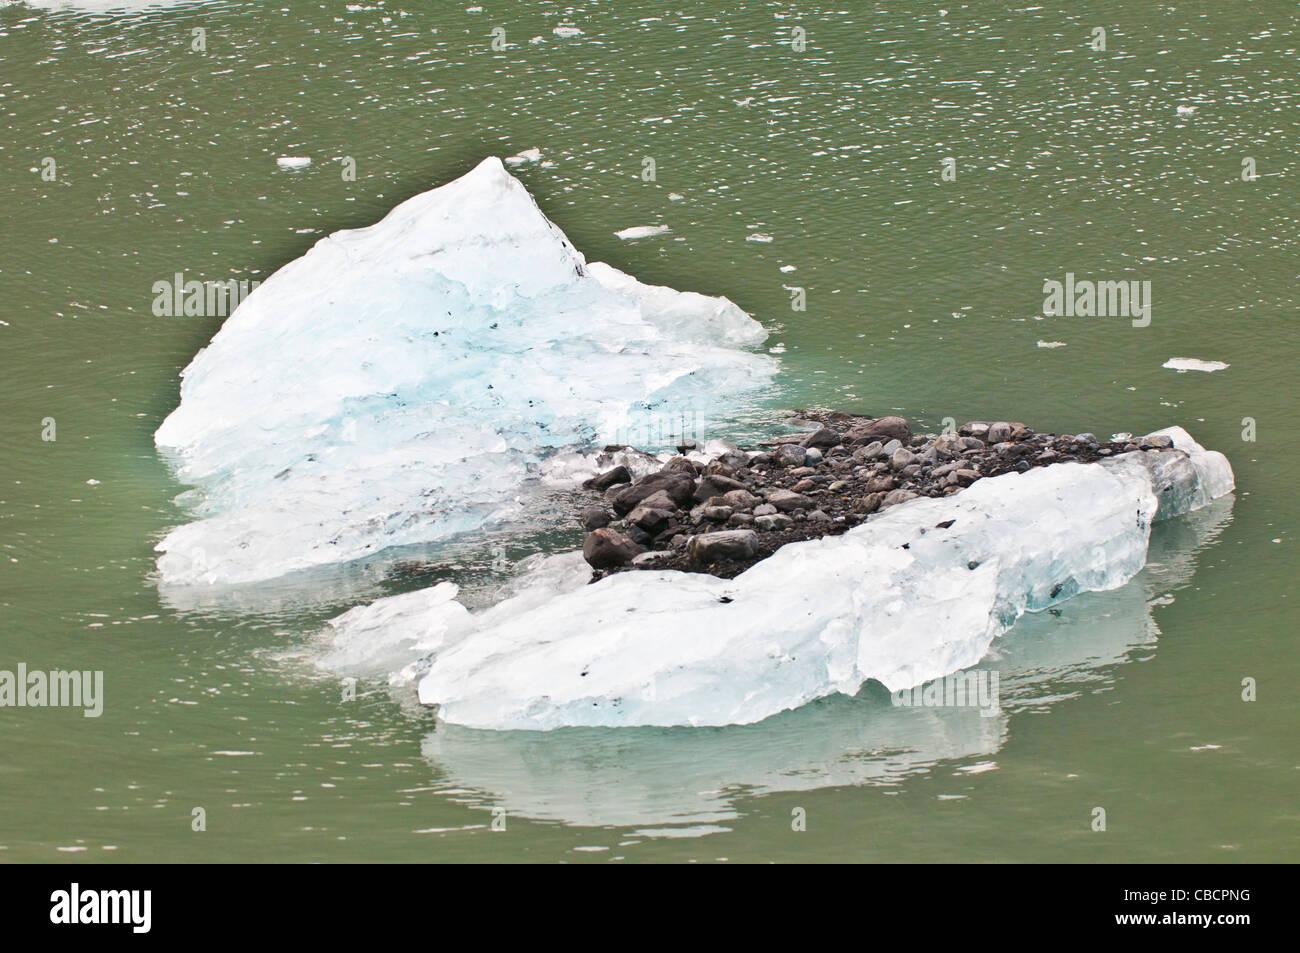 Ice berg carrying glacial gravel, Holgate Arm, Kenai Fjords National Park, Seward, Alaska - Stock Image